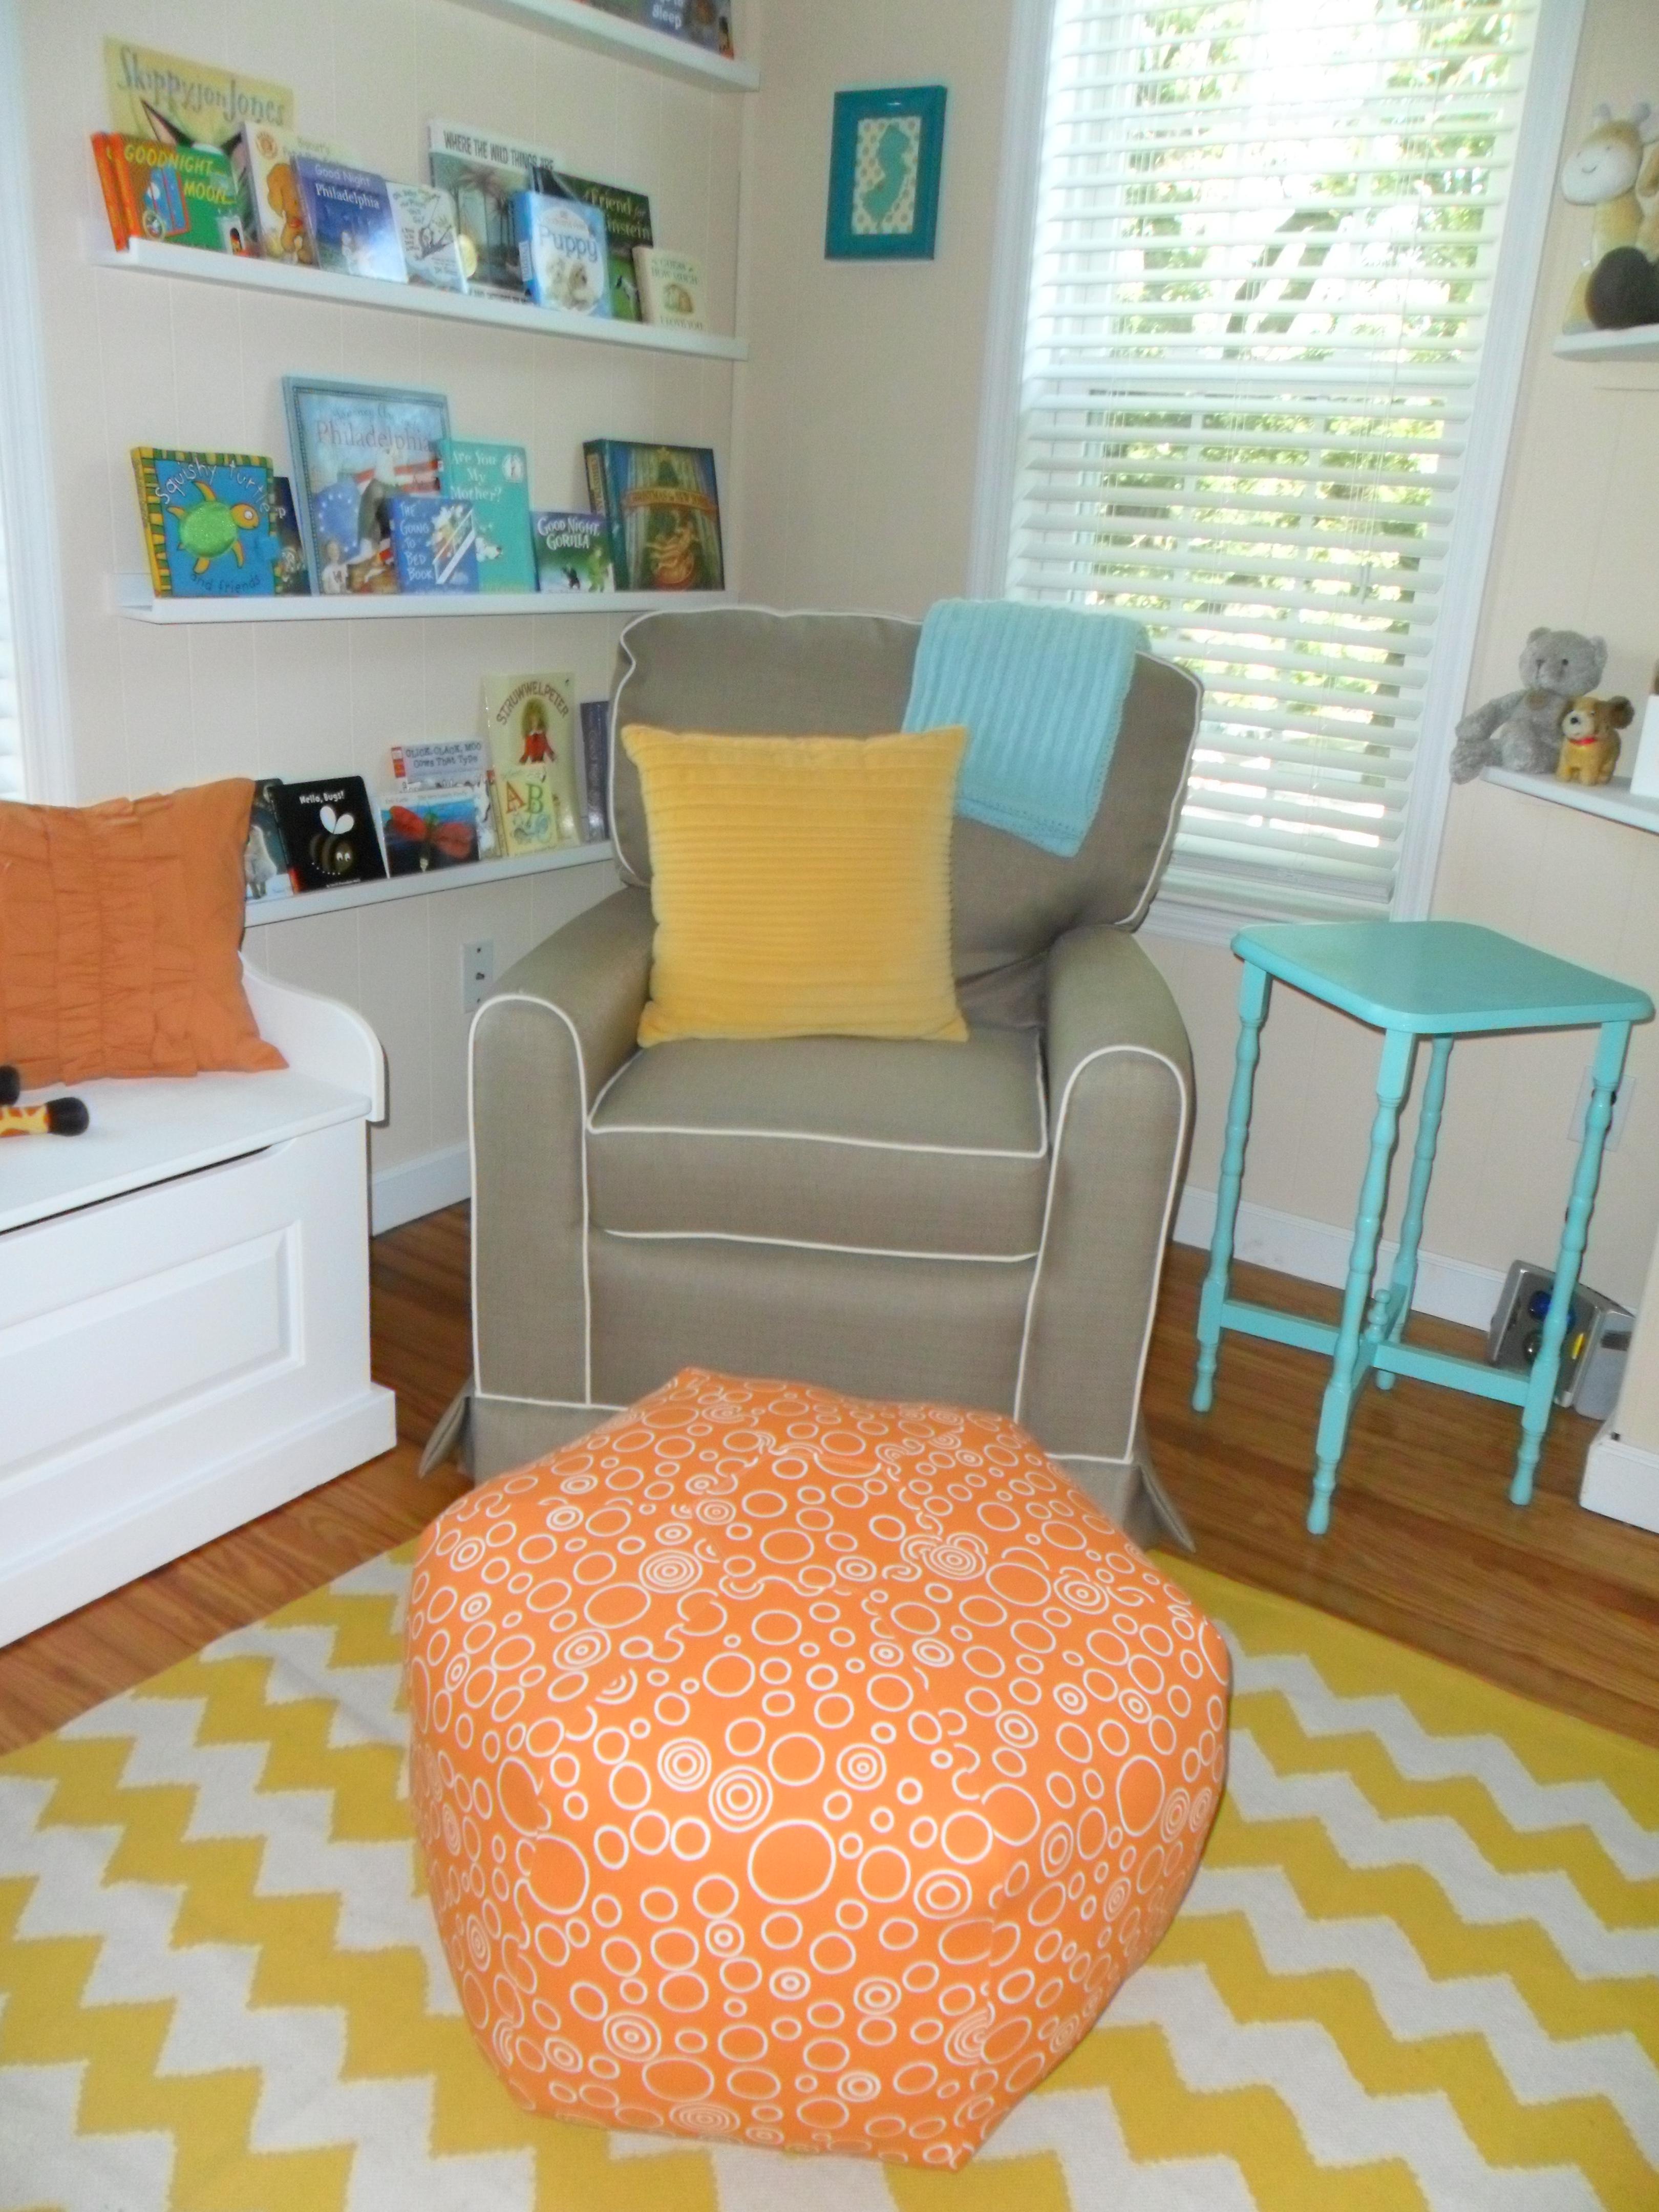 Baby Kopp's Nursery – Finally Finished!